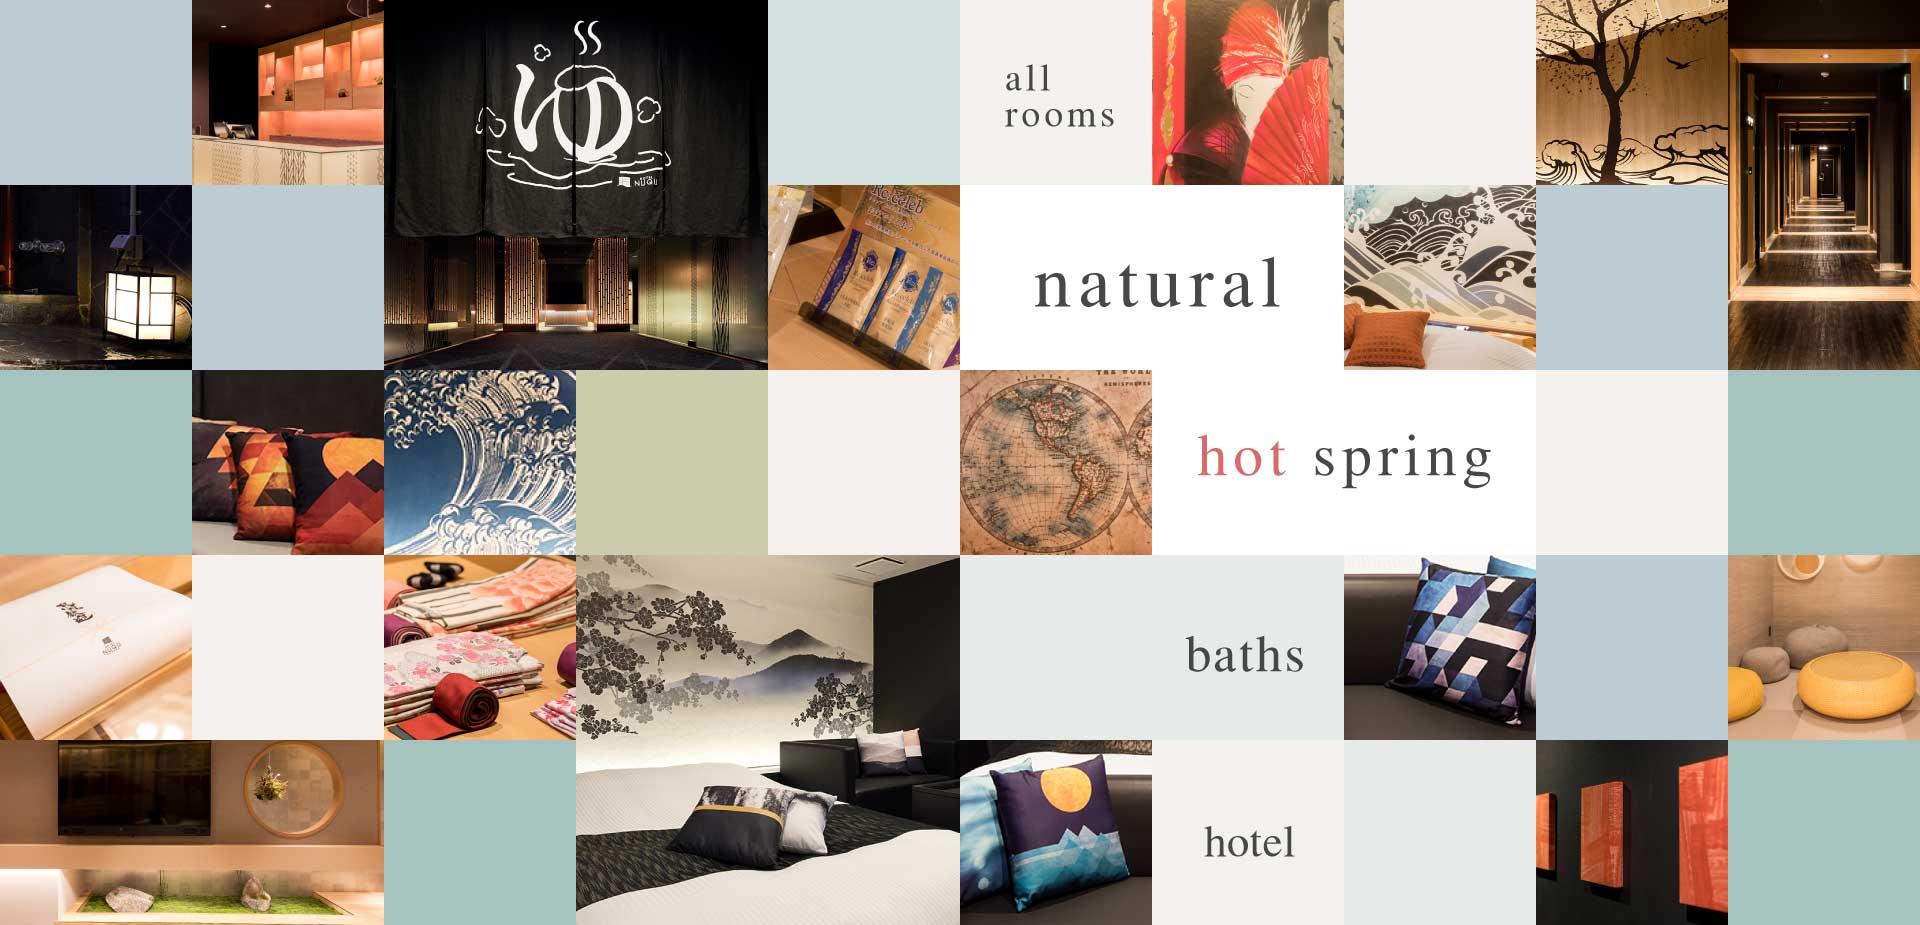 all rooms natural hot spring baths